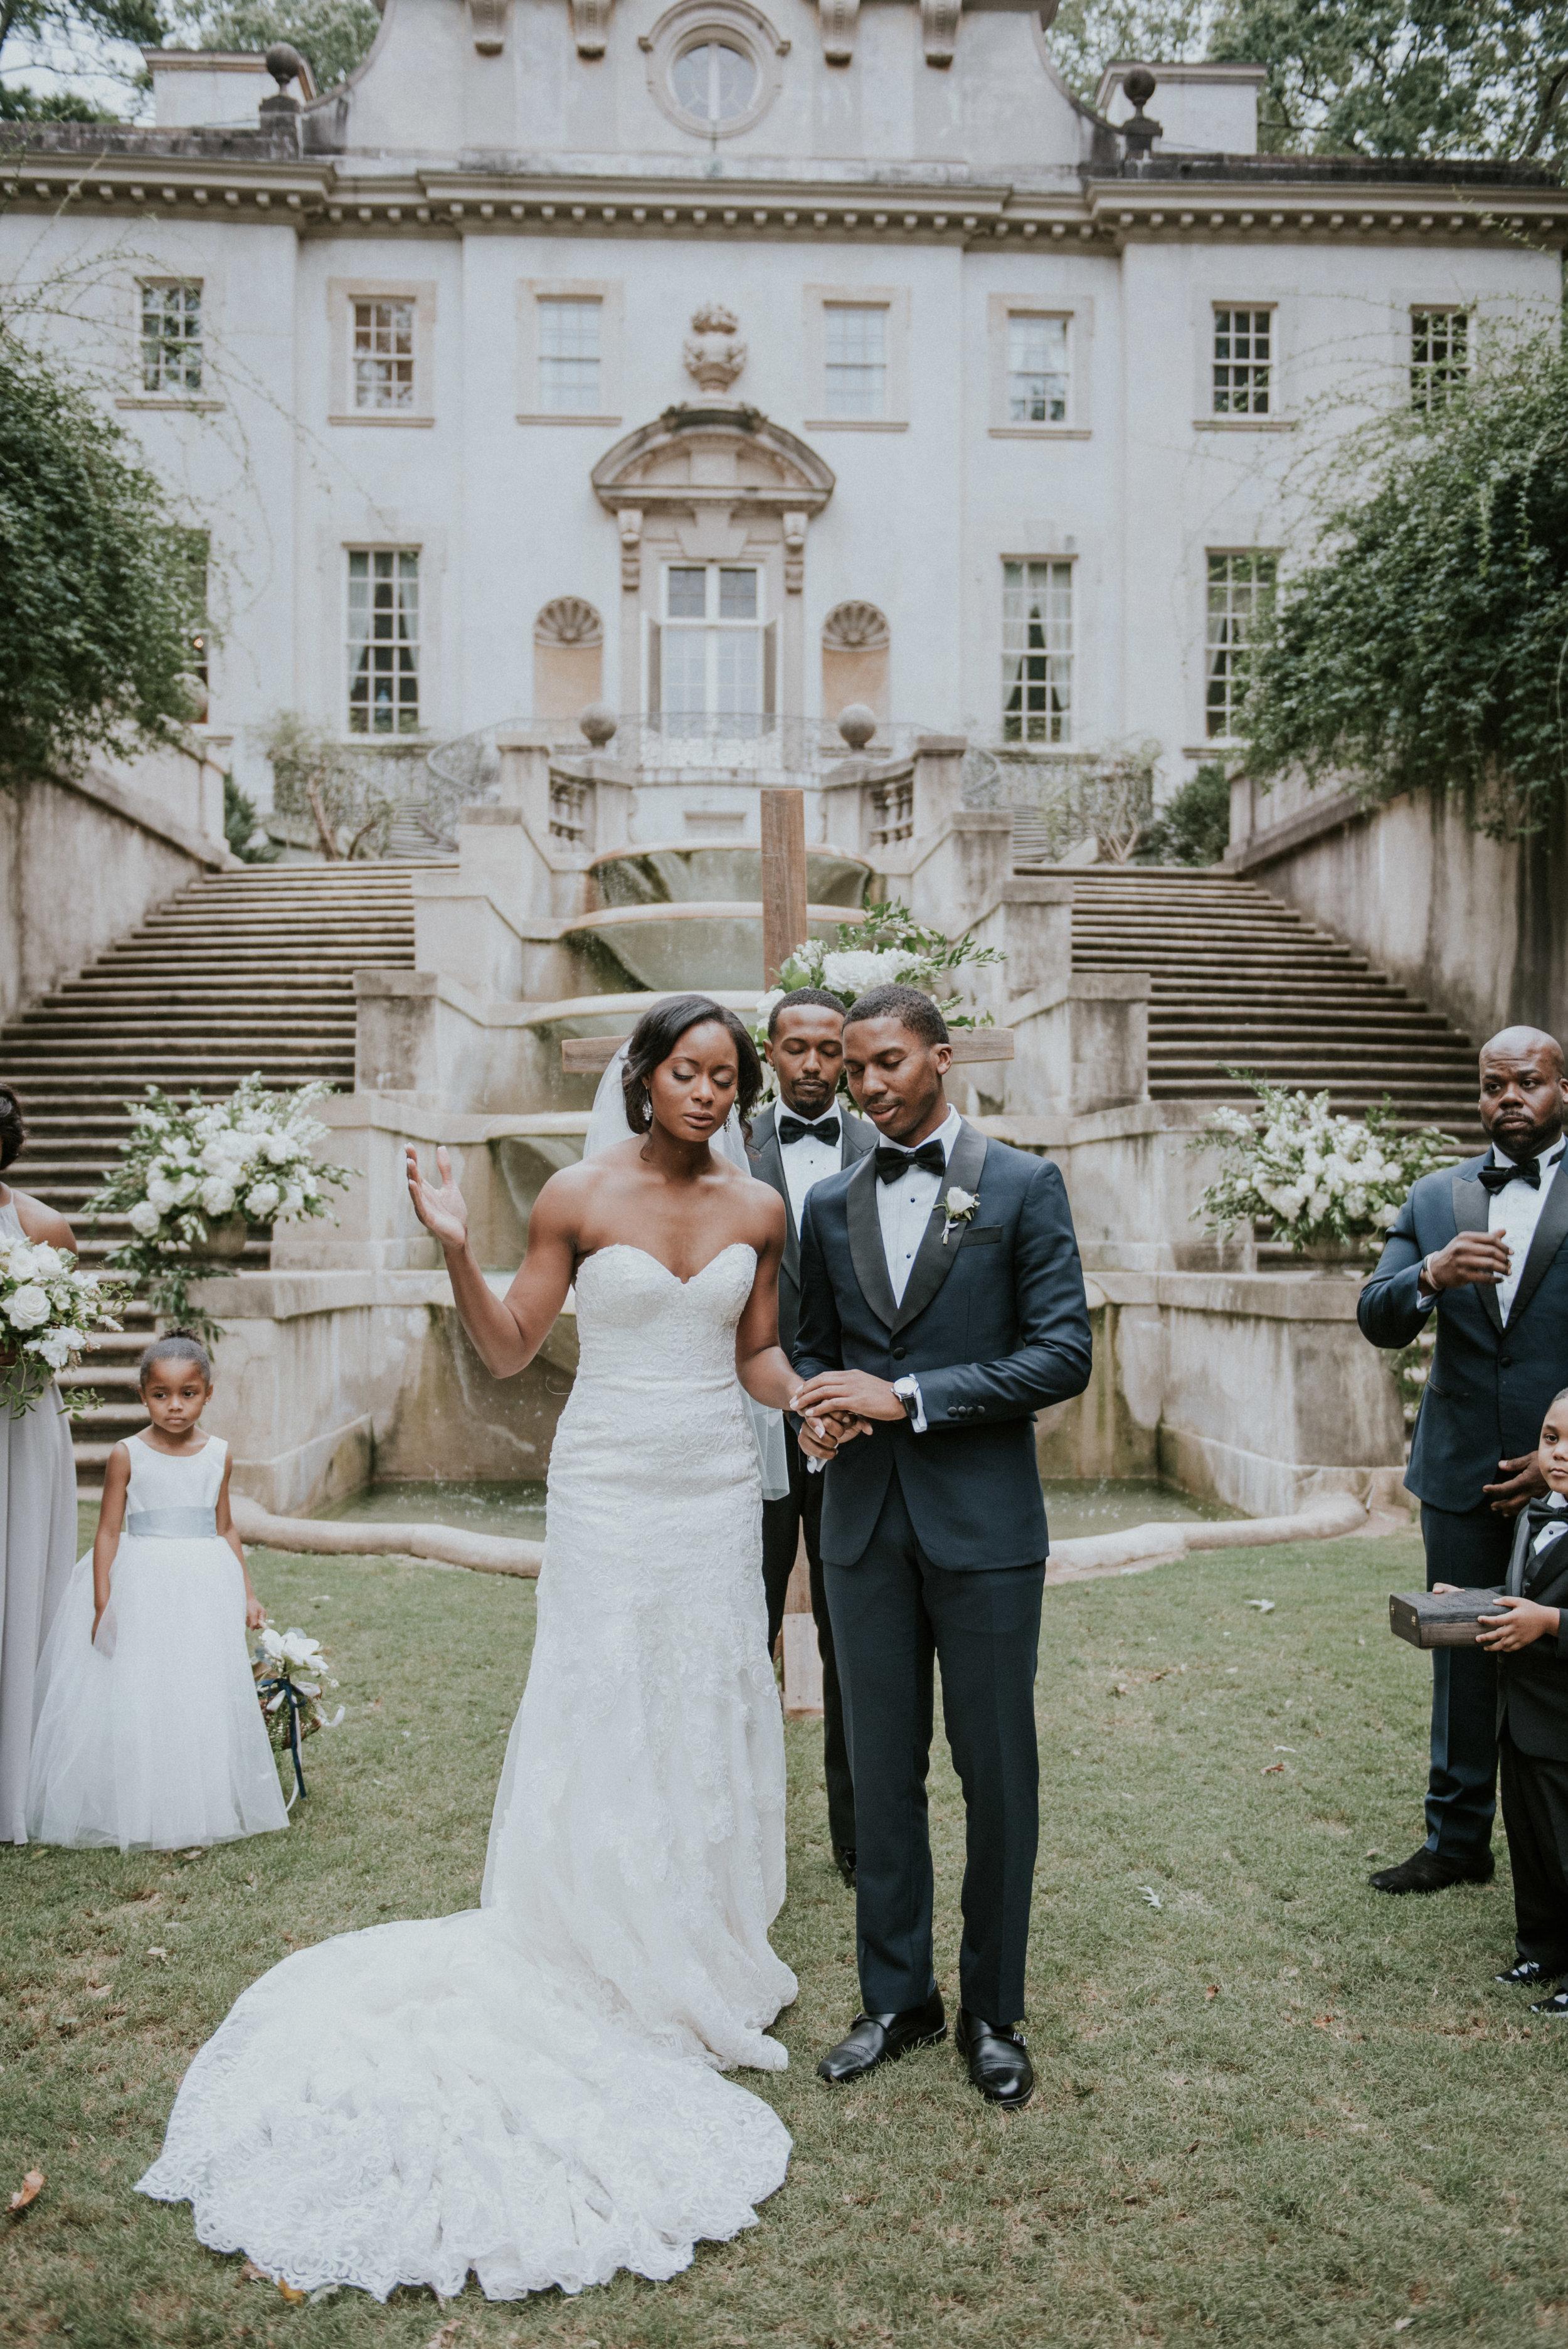 Bride and groom pray at wedding ceremony